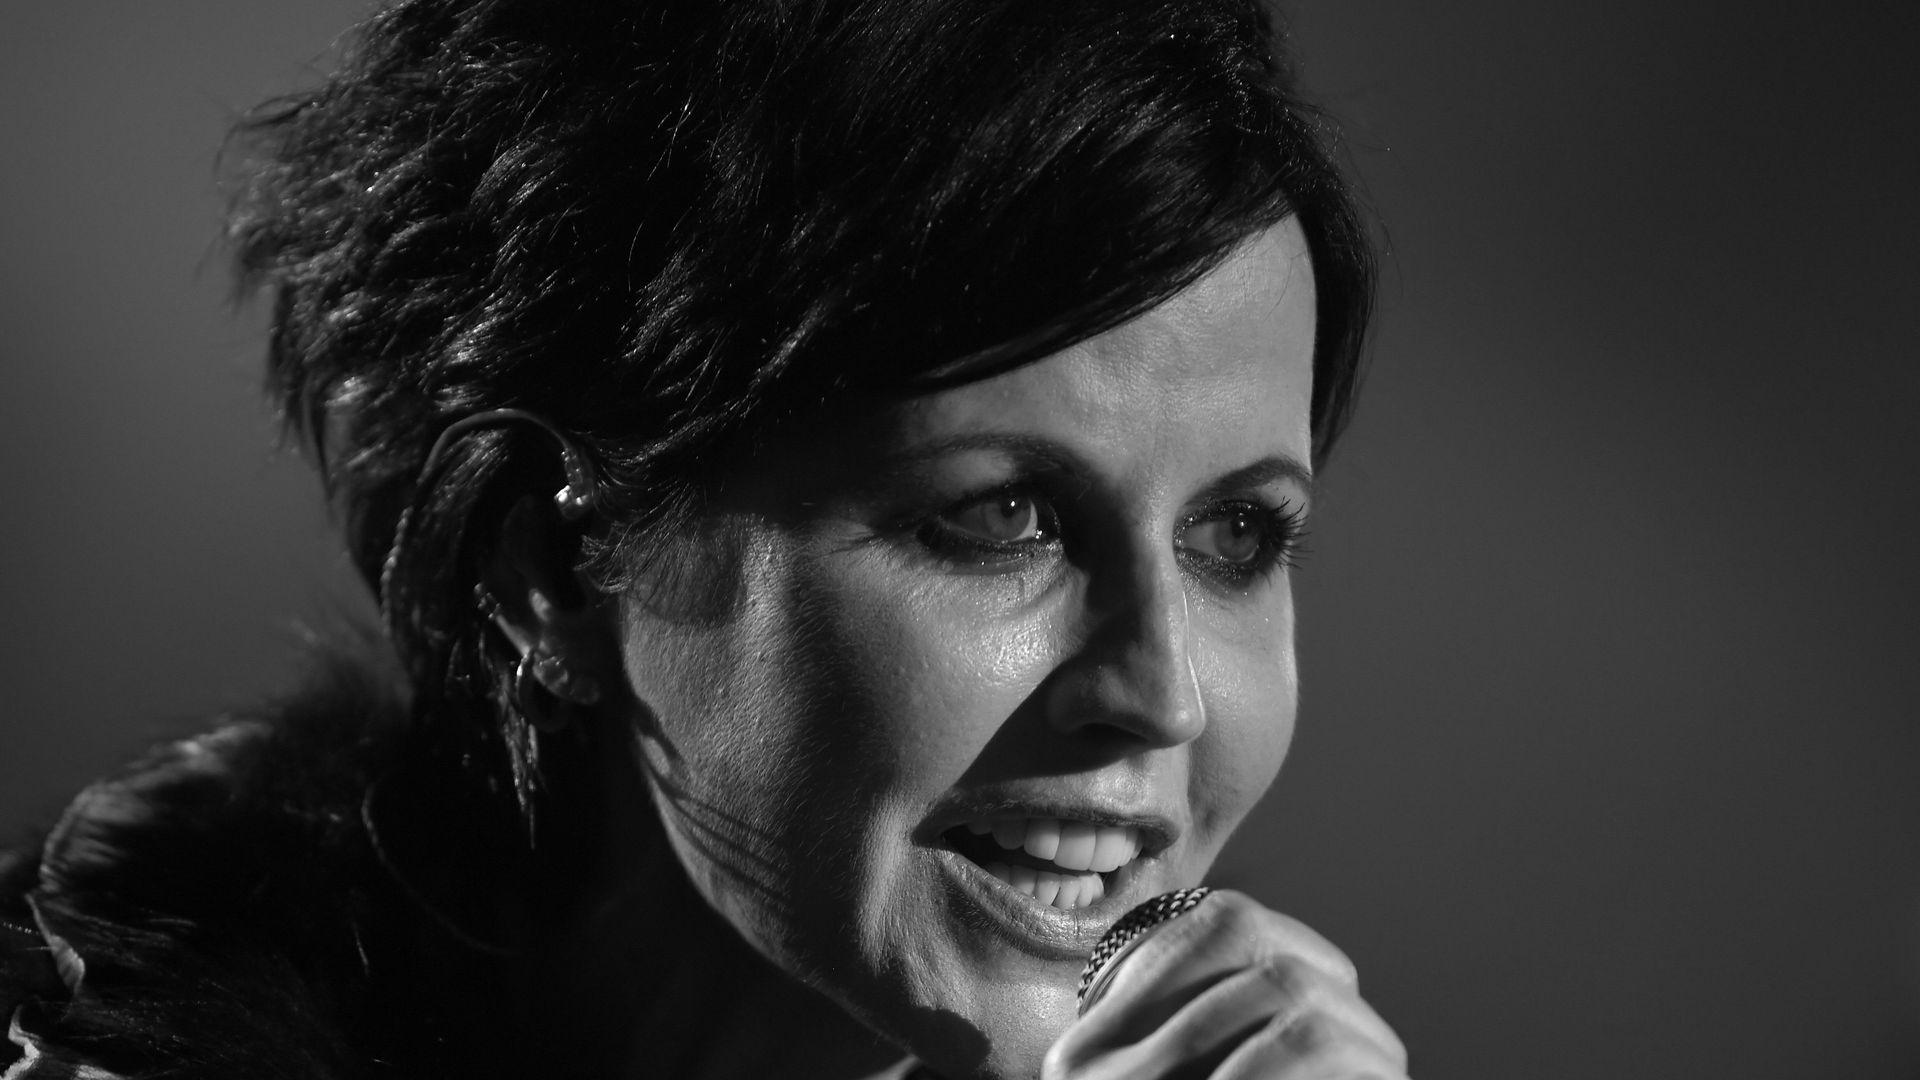 Dolores O'Riordans Tod: 1. Emotionale Worte ihrer Mutter ...